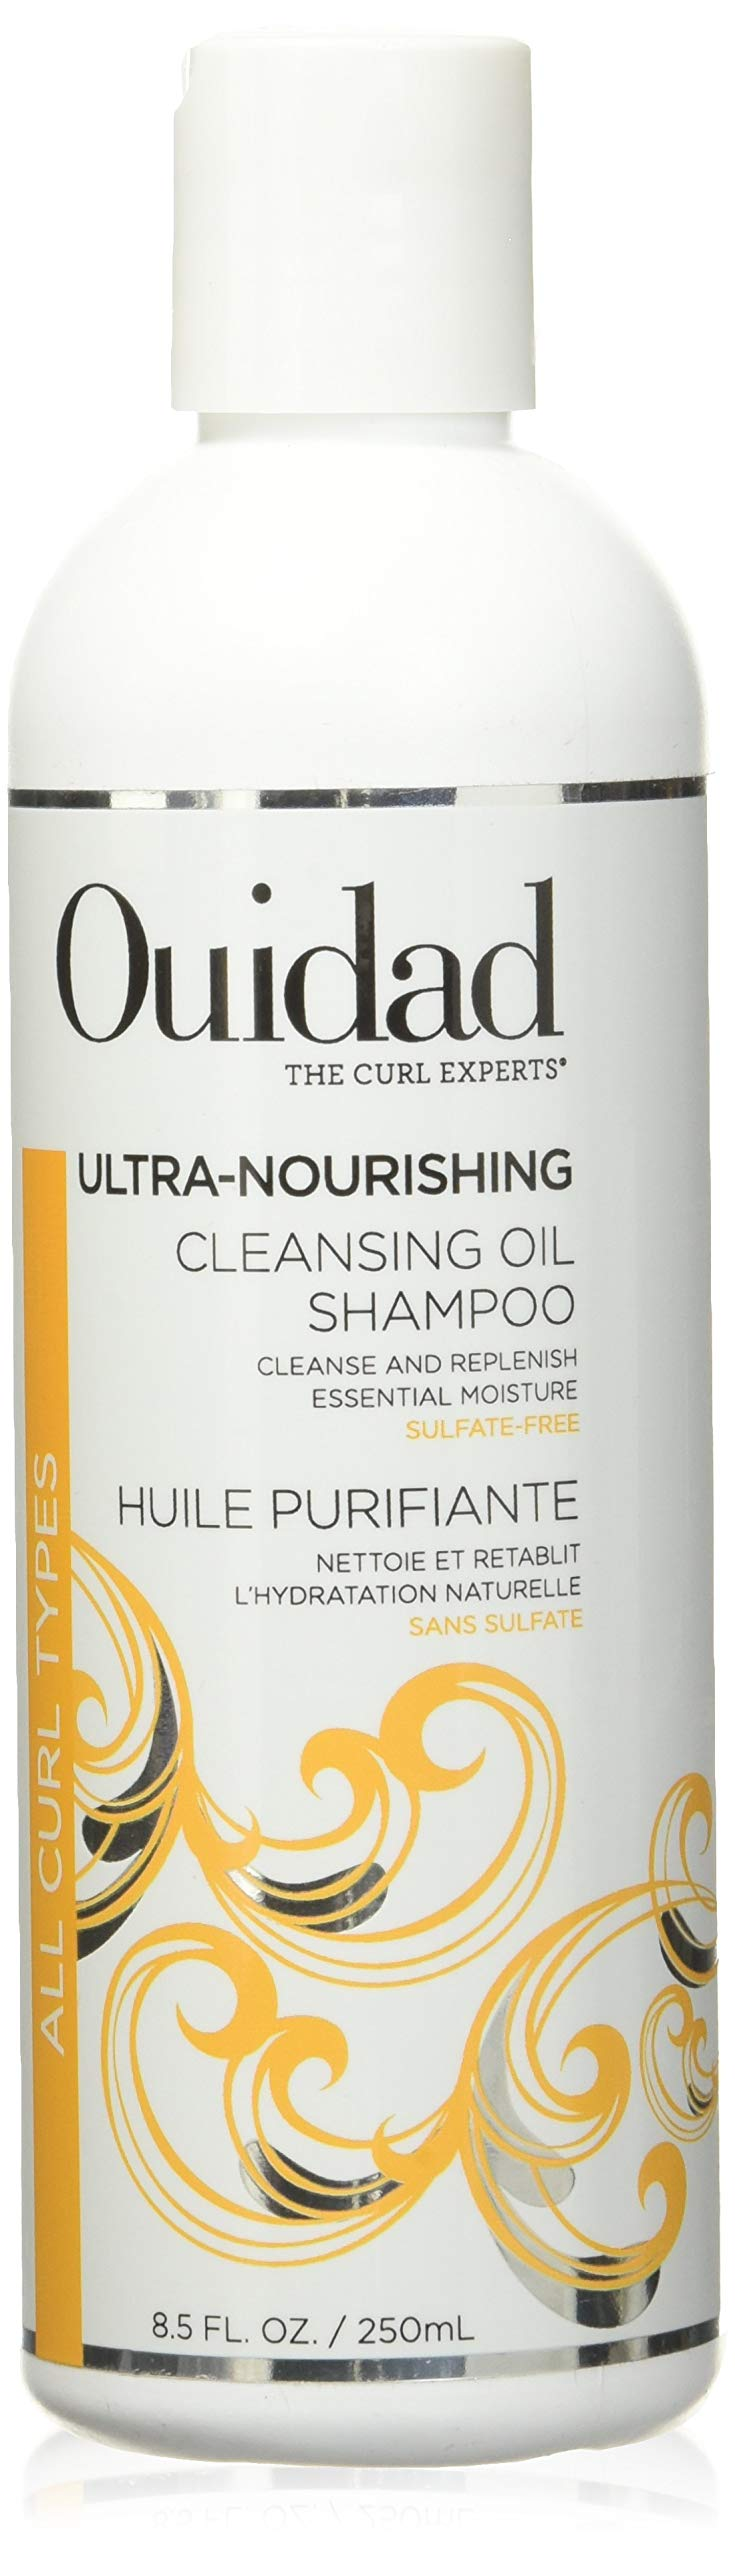 OUIDAD Ultra-nourishing Cleansing Oil Shampoo, 8.5 Fl oz